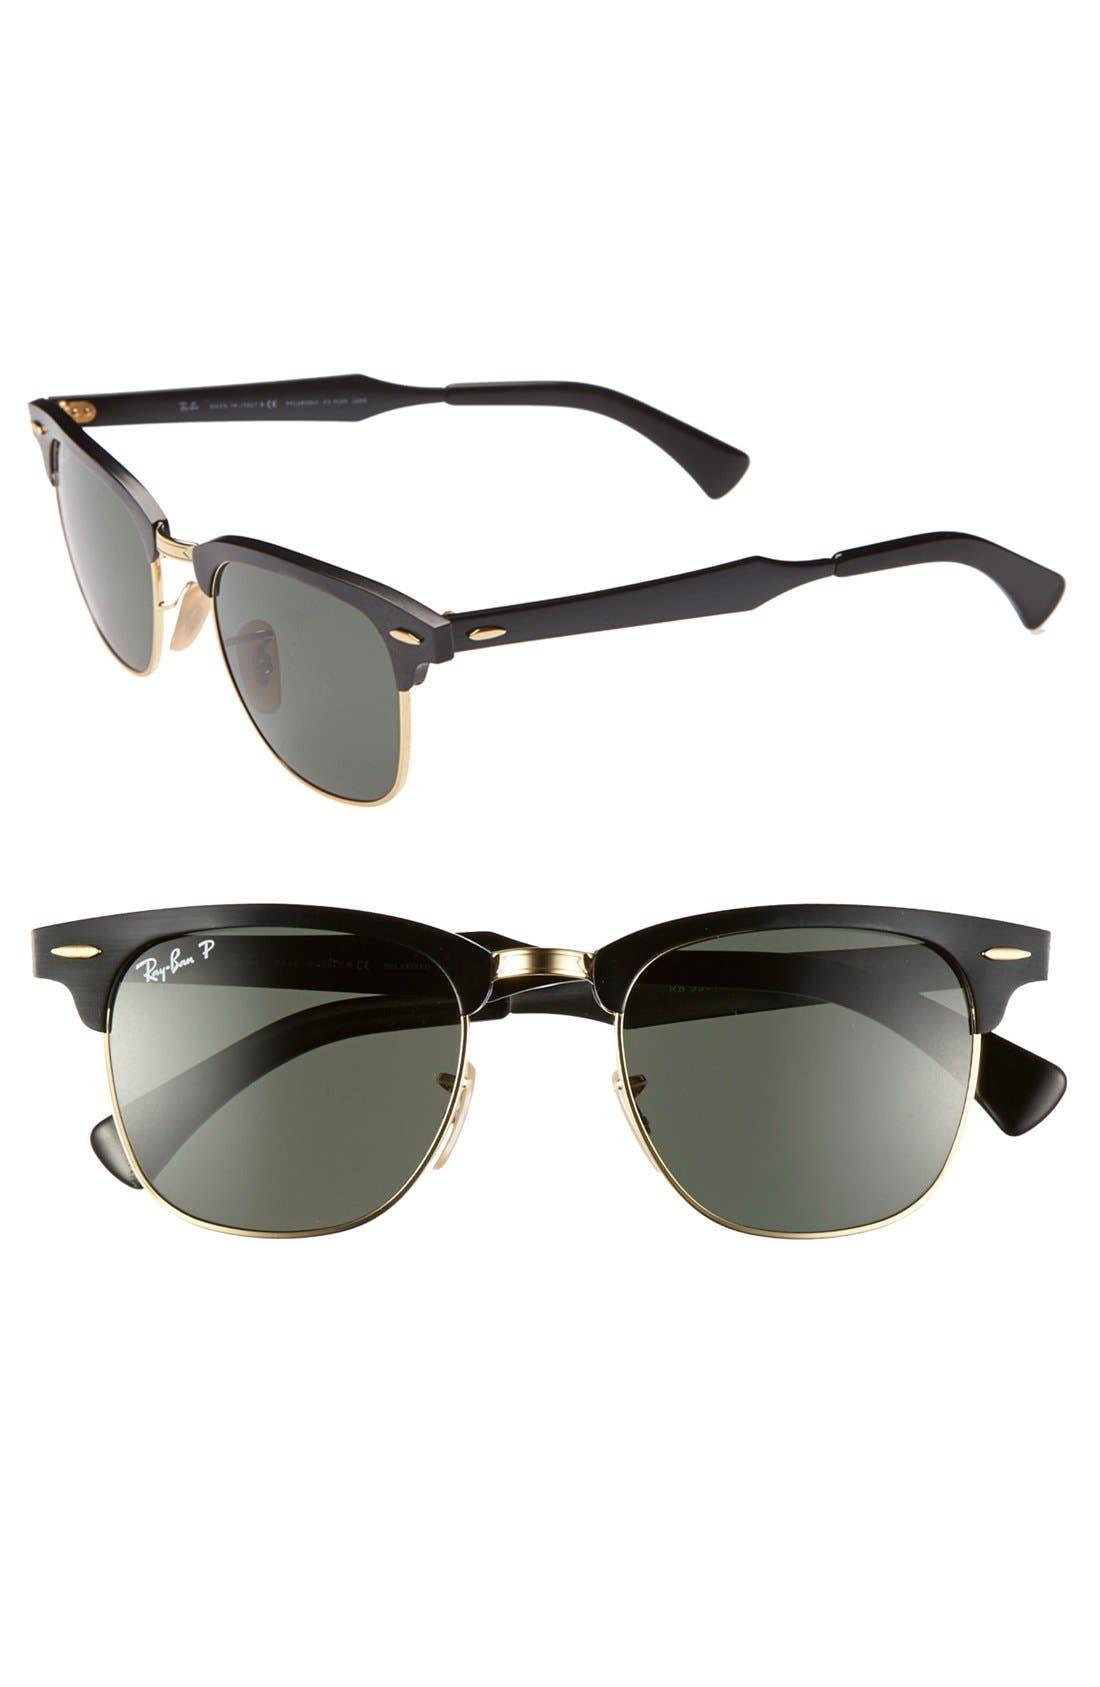 Main Image - Ray-Ban Polarized 'Clubmaster' 49mm Sunglasses